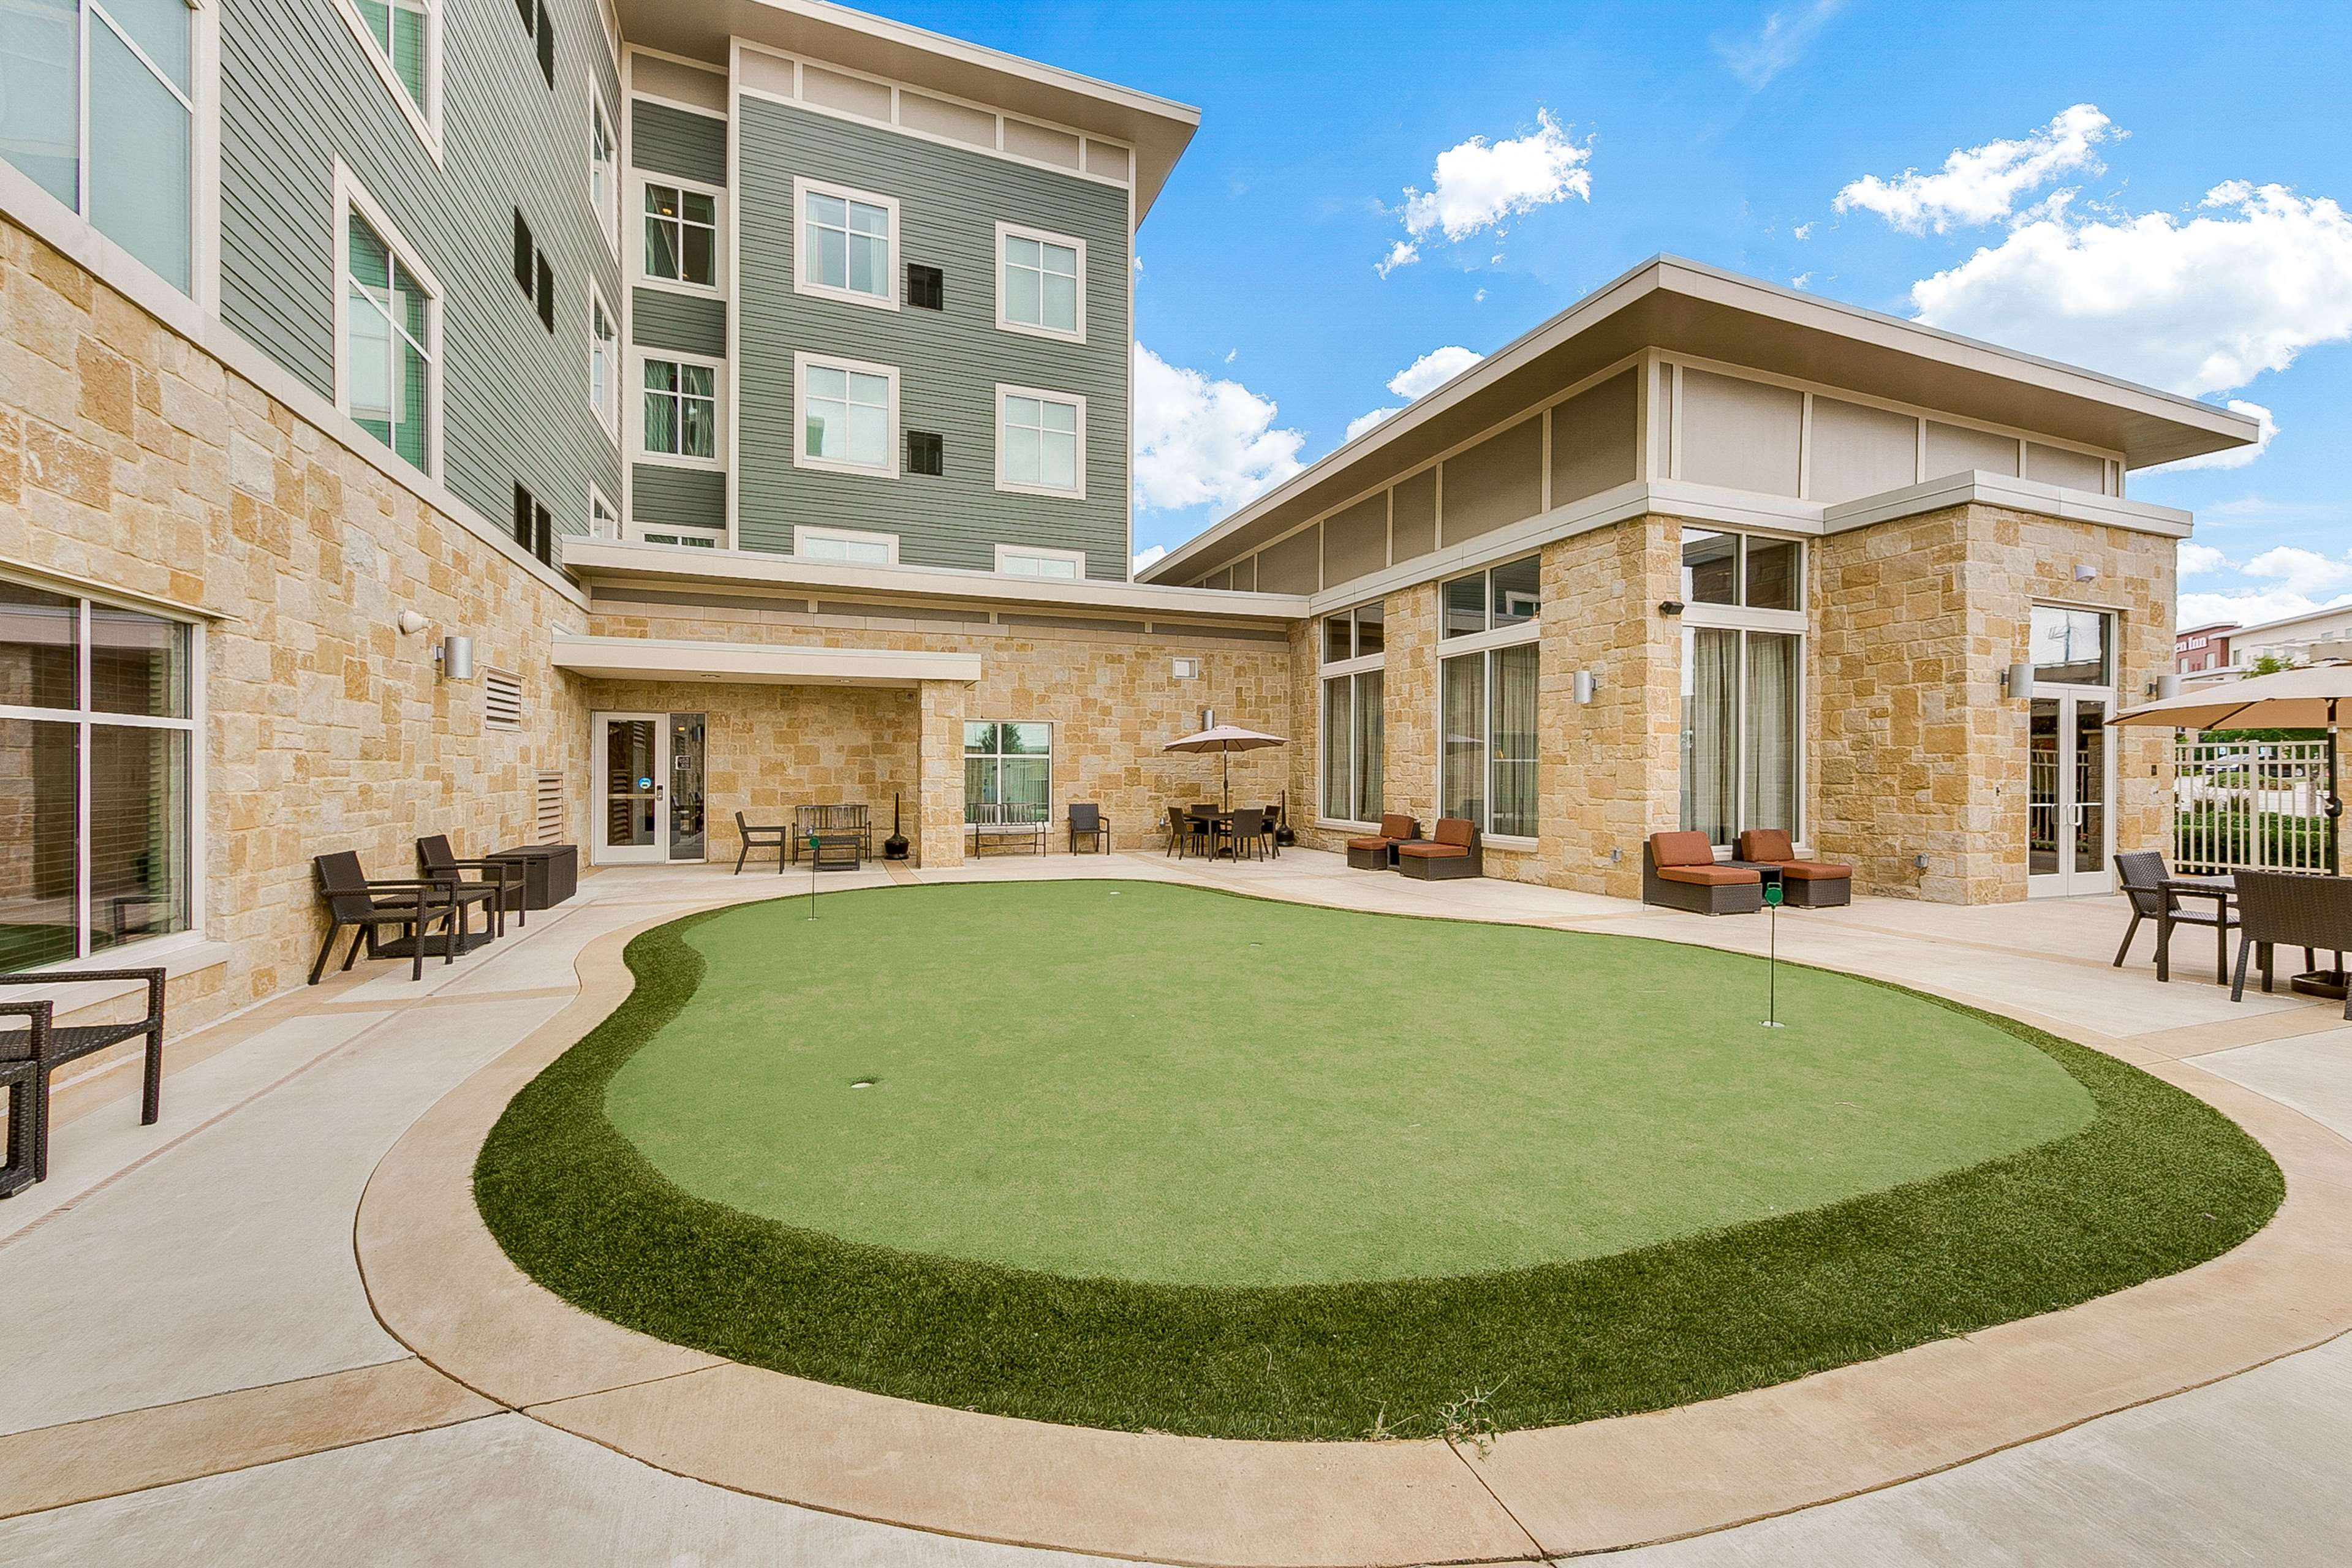 Homewood Suites by Hilton Fort Worth - Medical Center, TX image 2